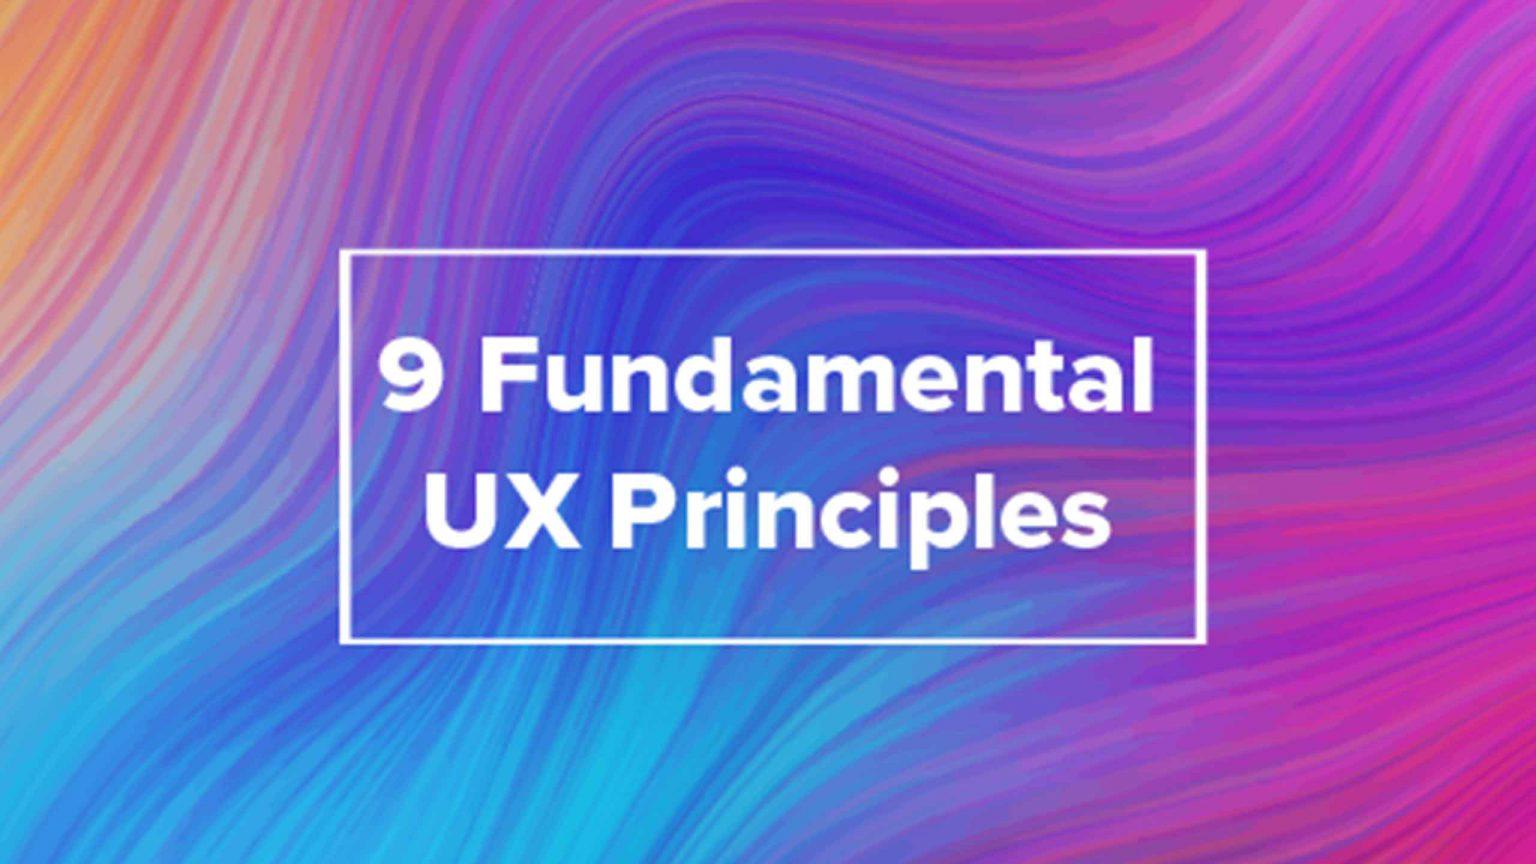 Fundamental UX Principles